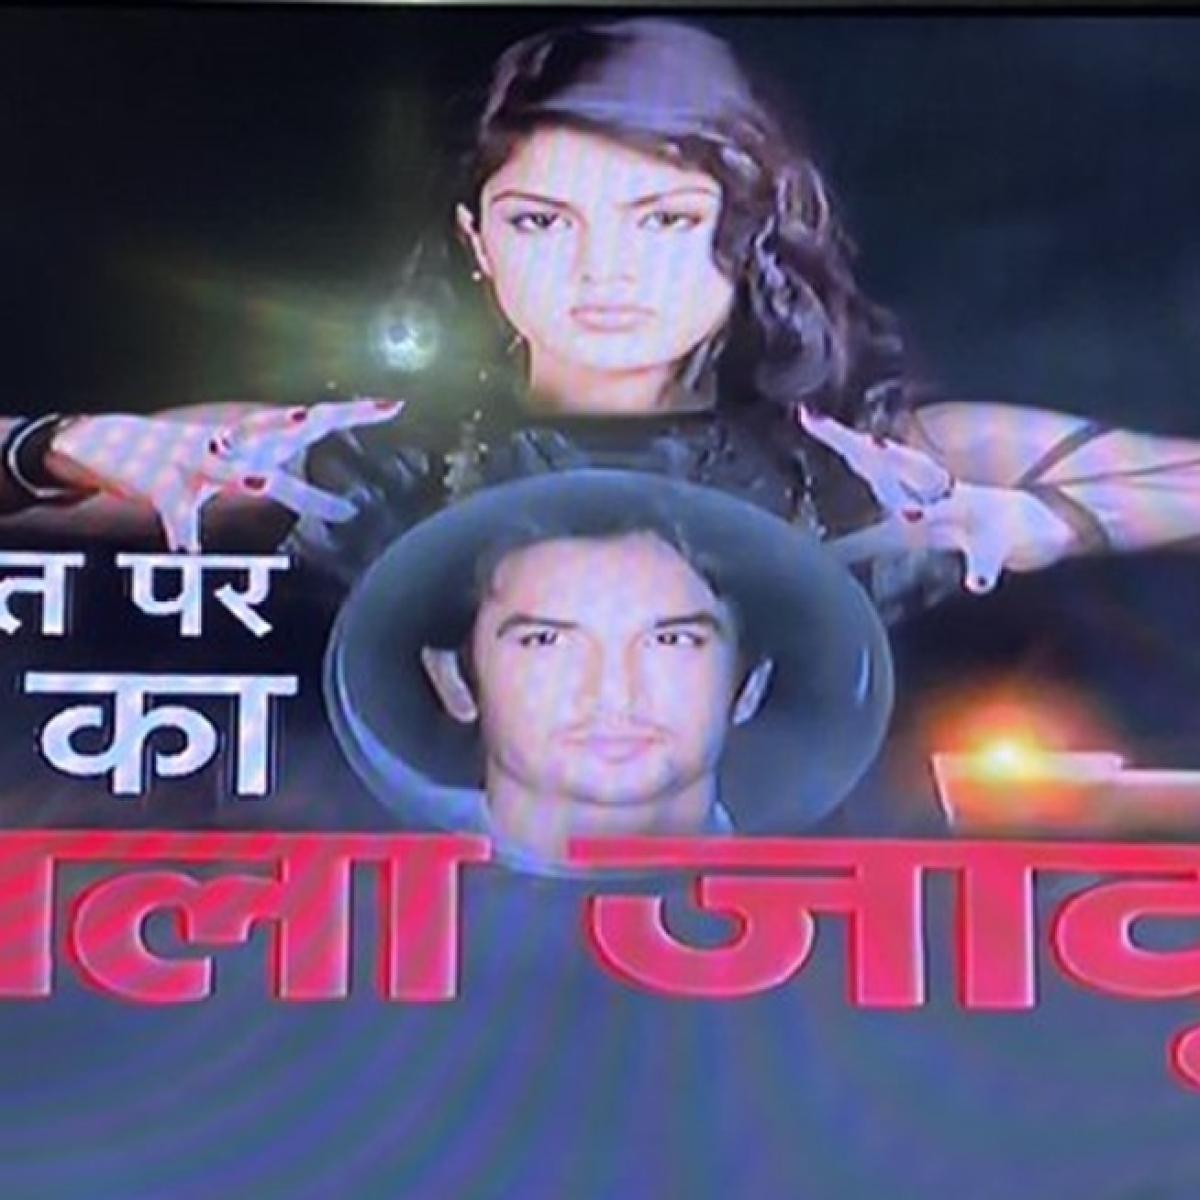 'Gold standard of journalism': Twitter slams Aaj Tak for accusing Rhea of 'black magic' on Sushant